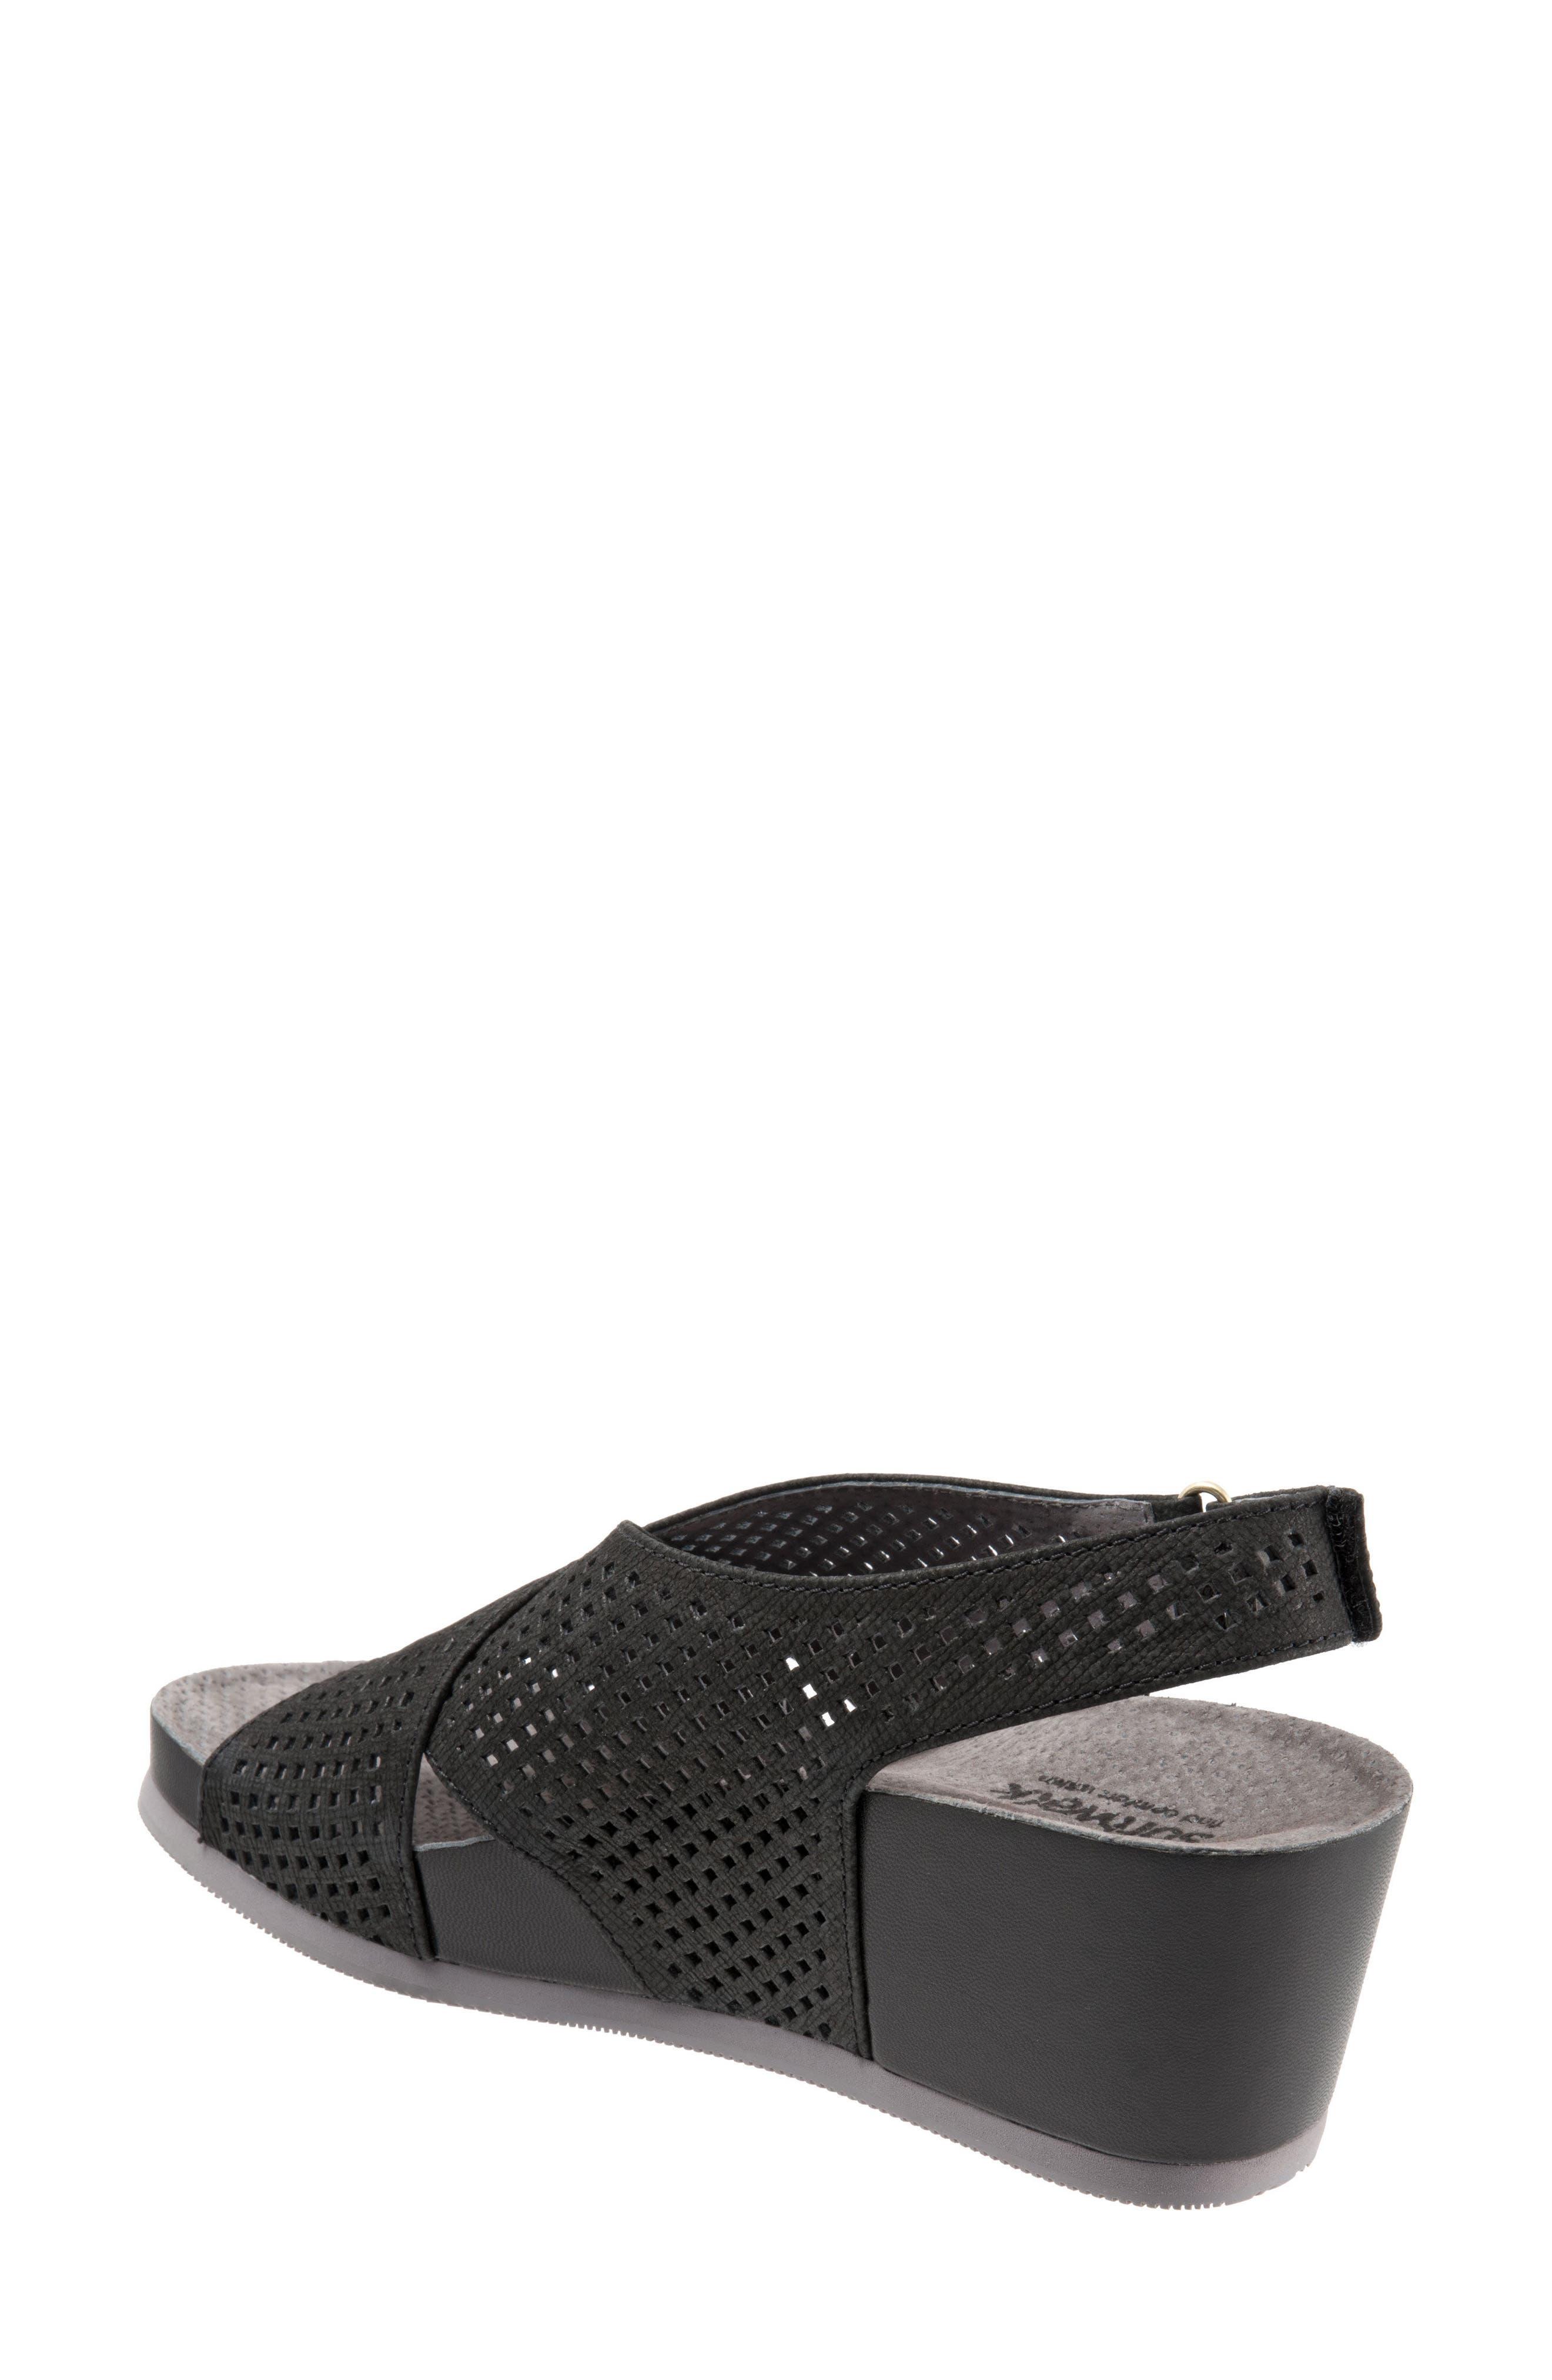 Hansford Wedge Sandal,                             Alternate thumbnail 2, color,                             Black Nubuck Leather